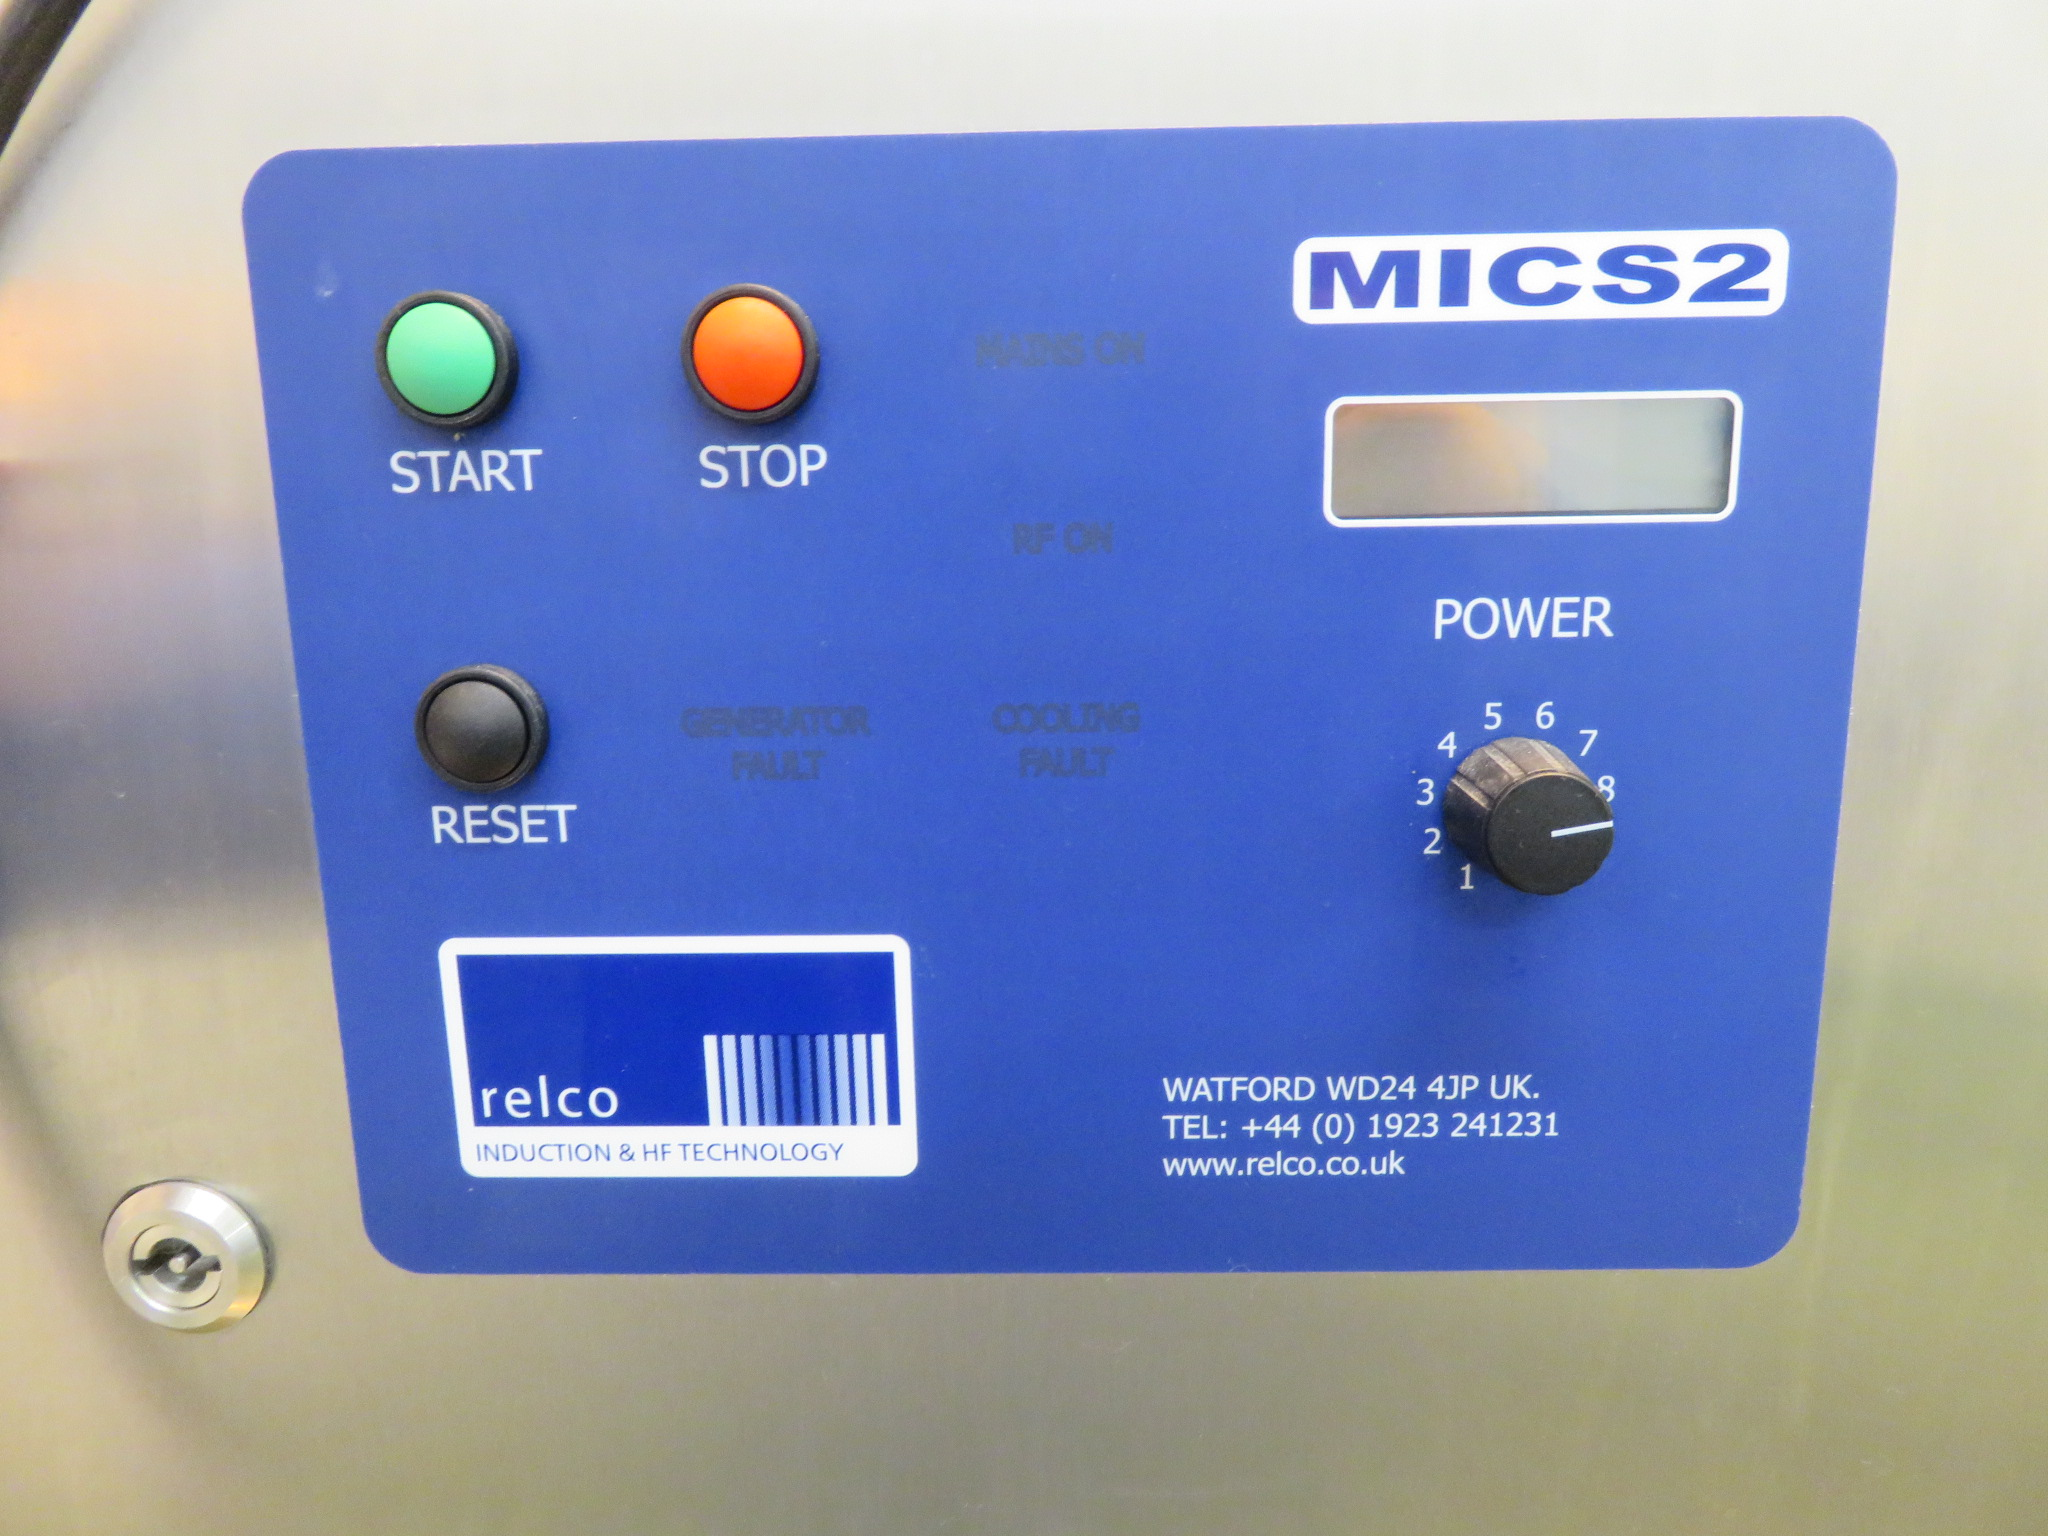 HF Technology induction sealing machine model MICS 2. LO £60. - Image 5 of 5